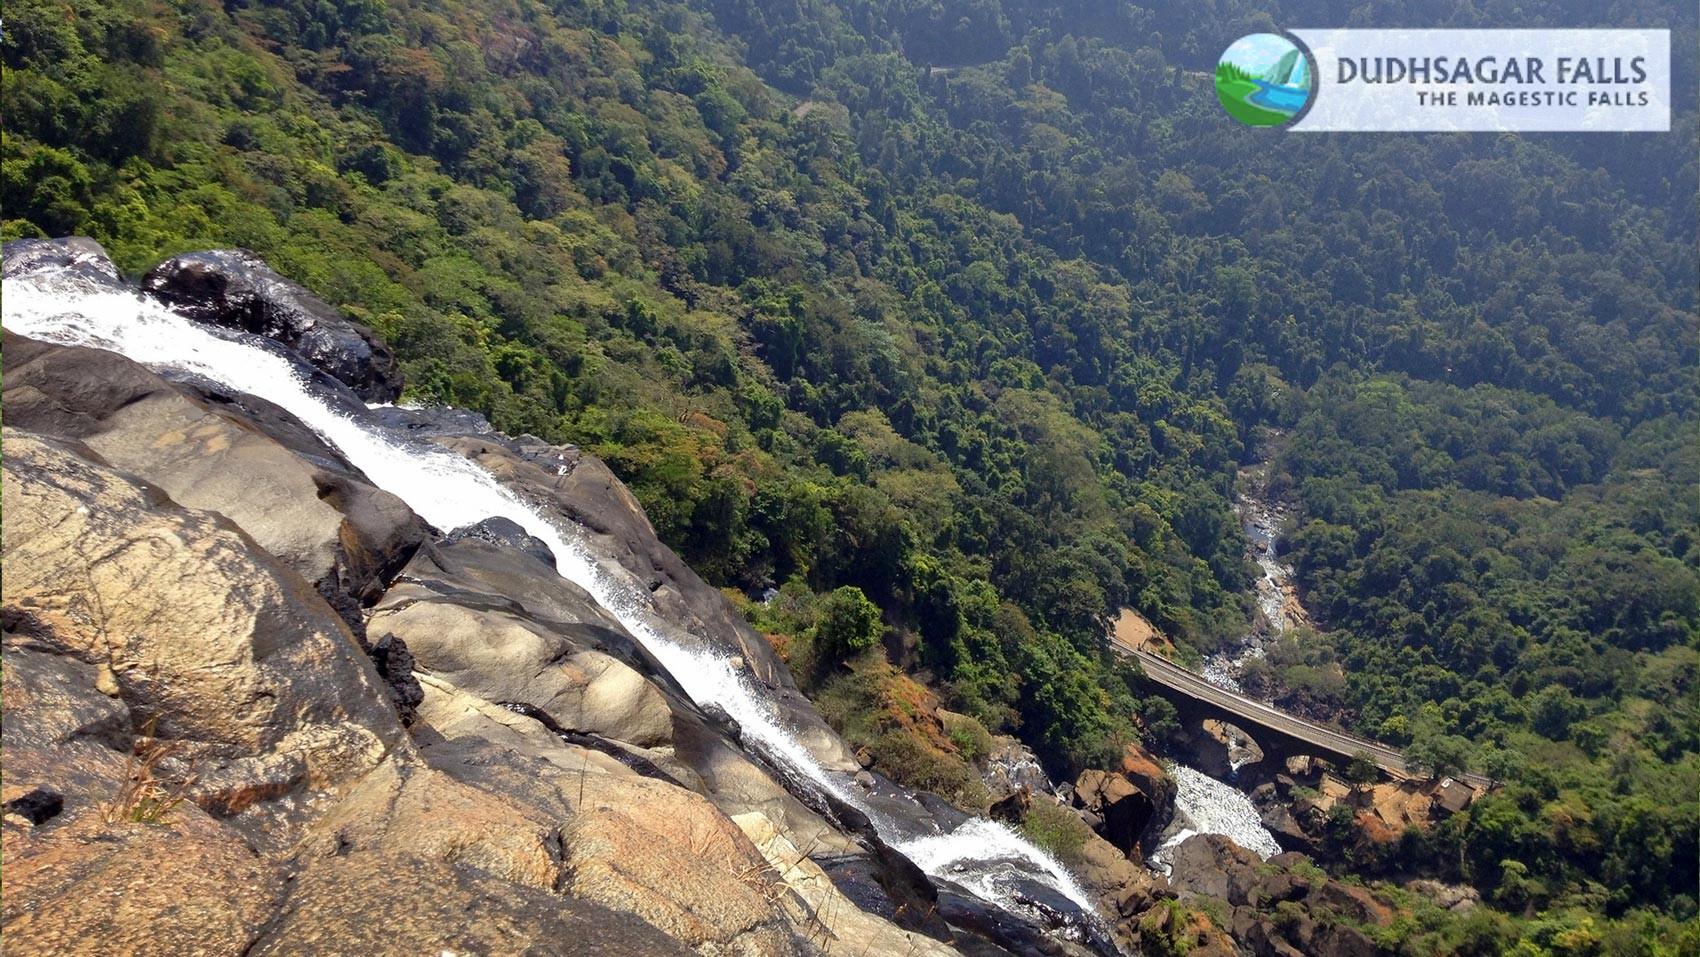 Dudhsagar Top View Amazing Photo